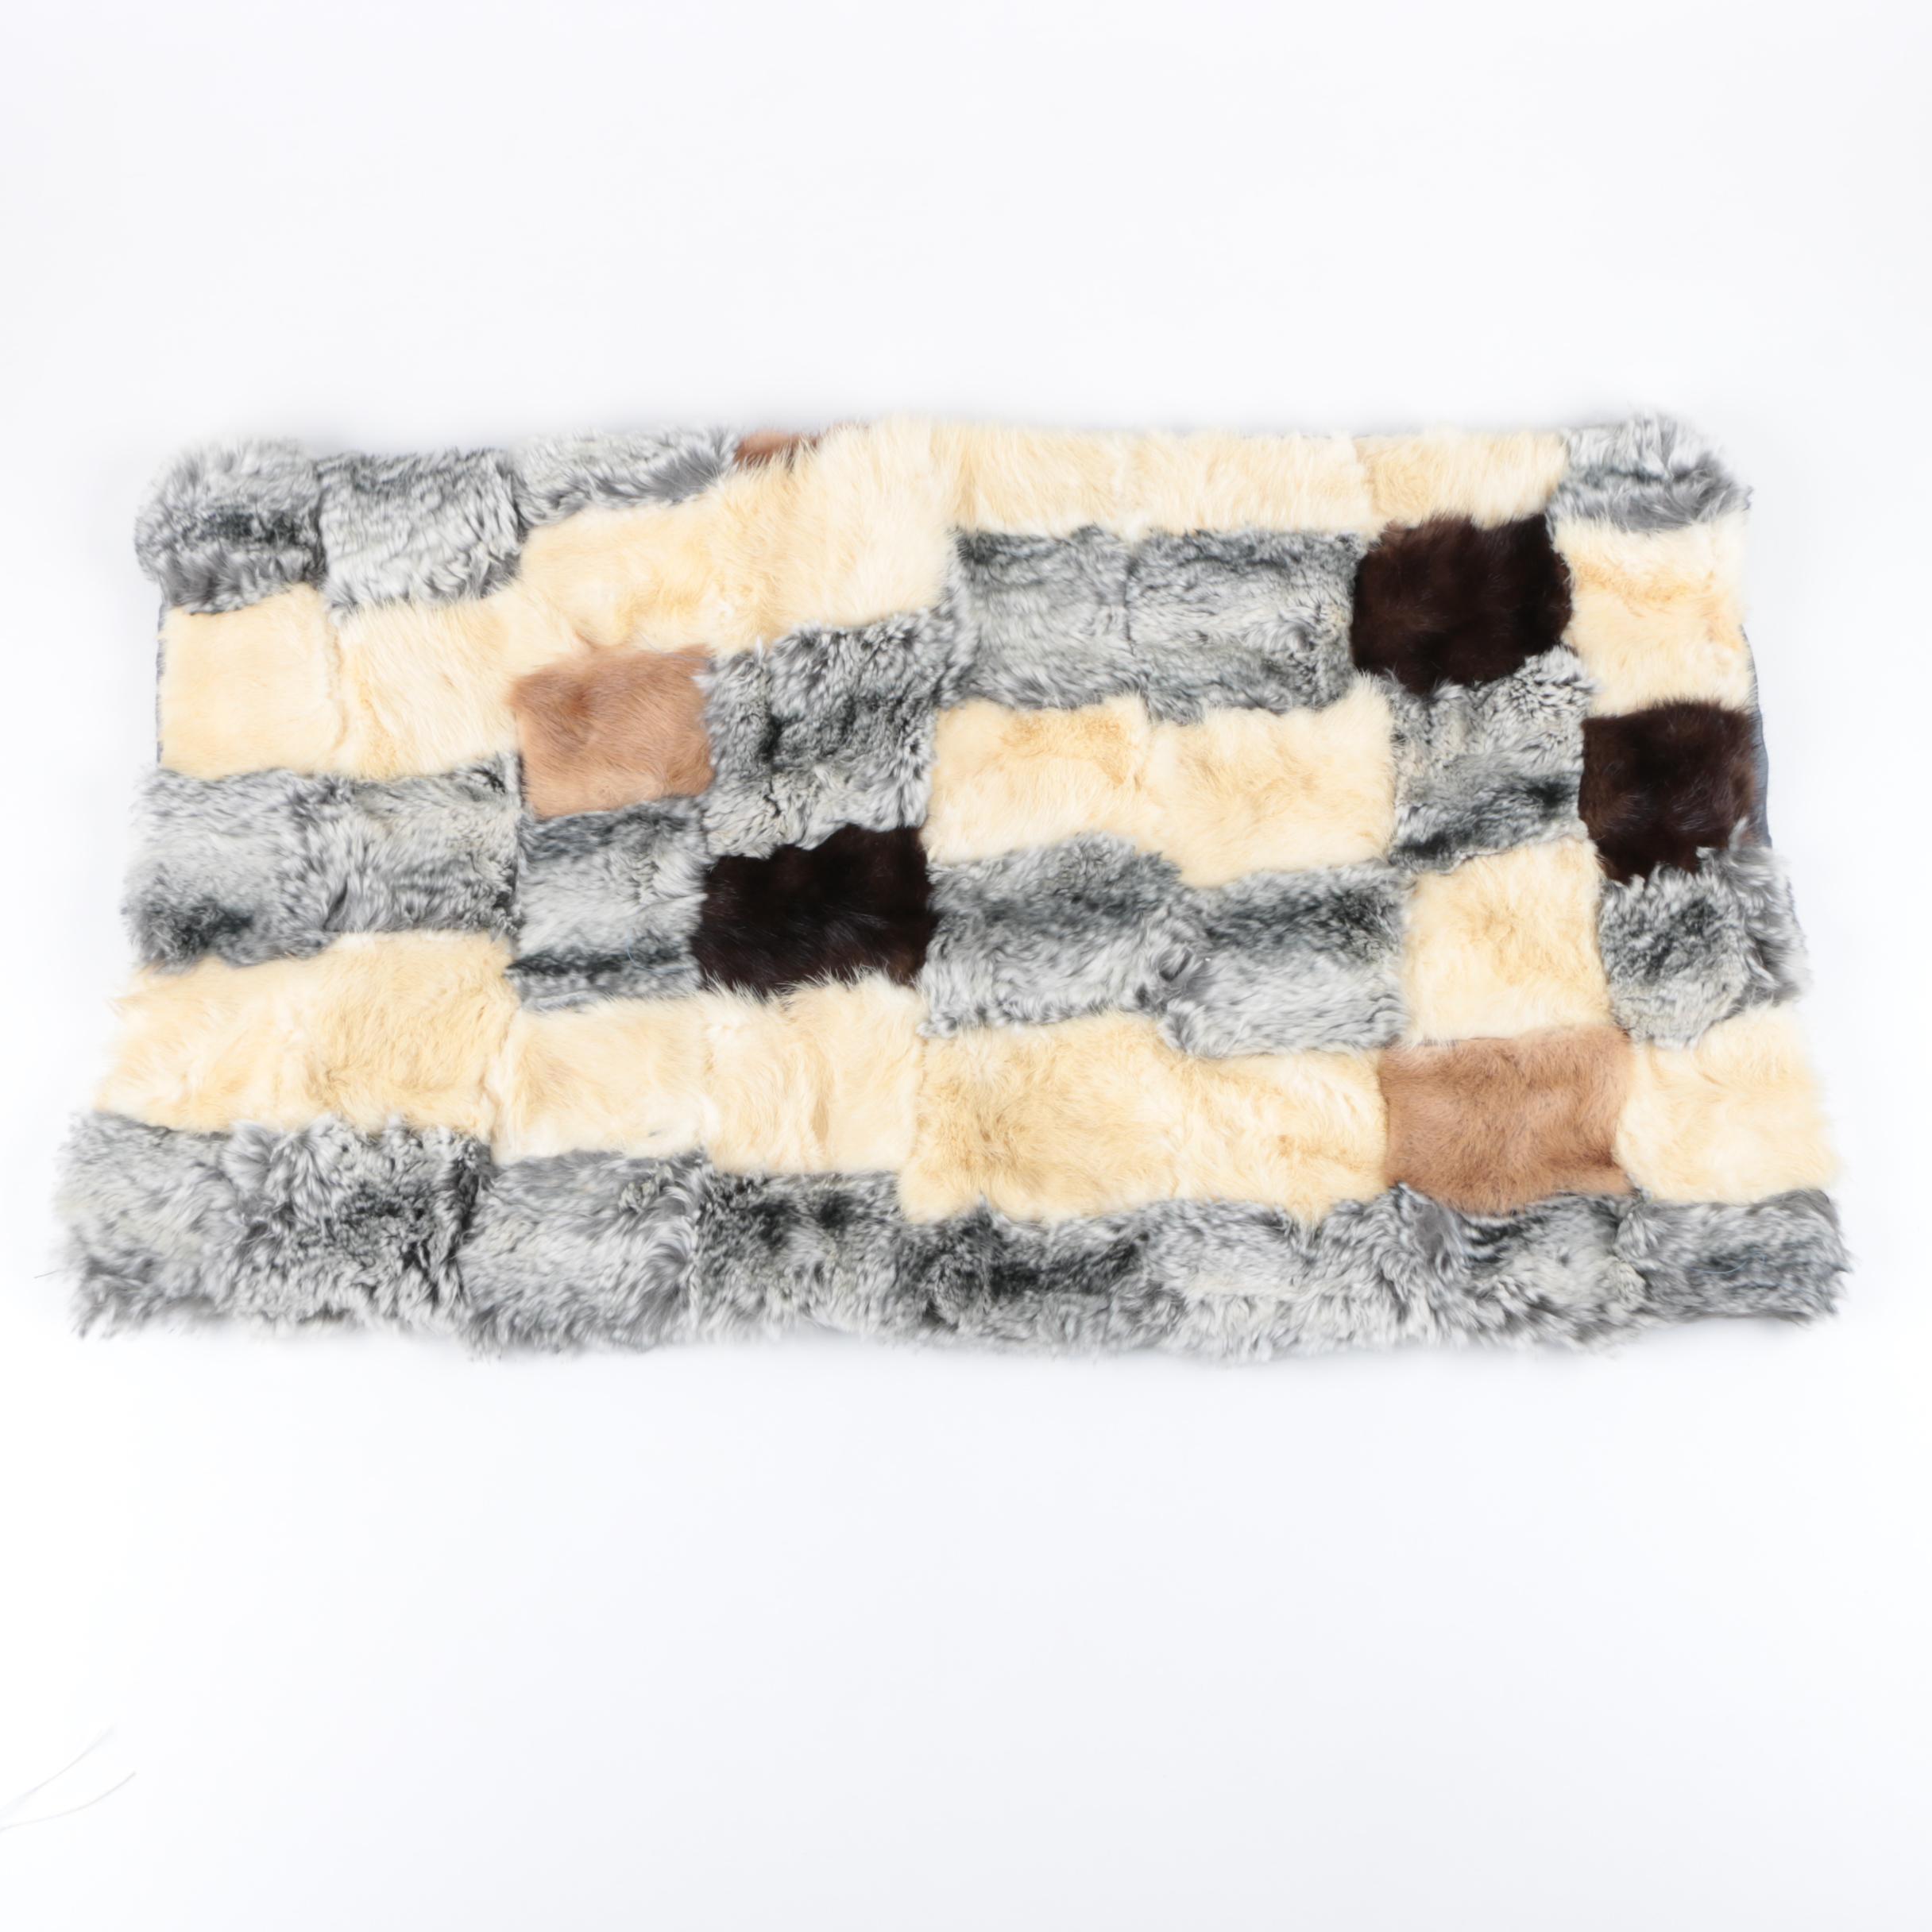 Mink and Rabbit Fur Patchwork Pelt